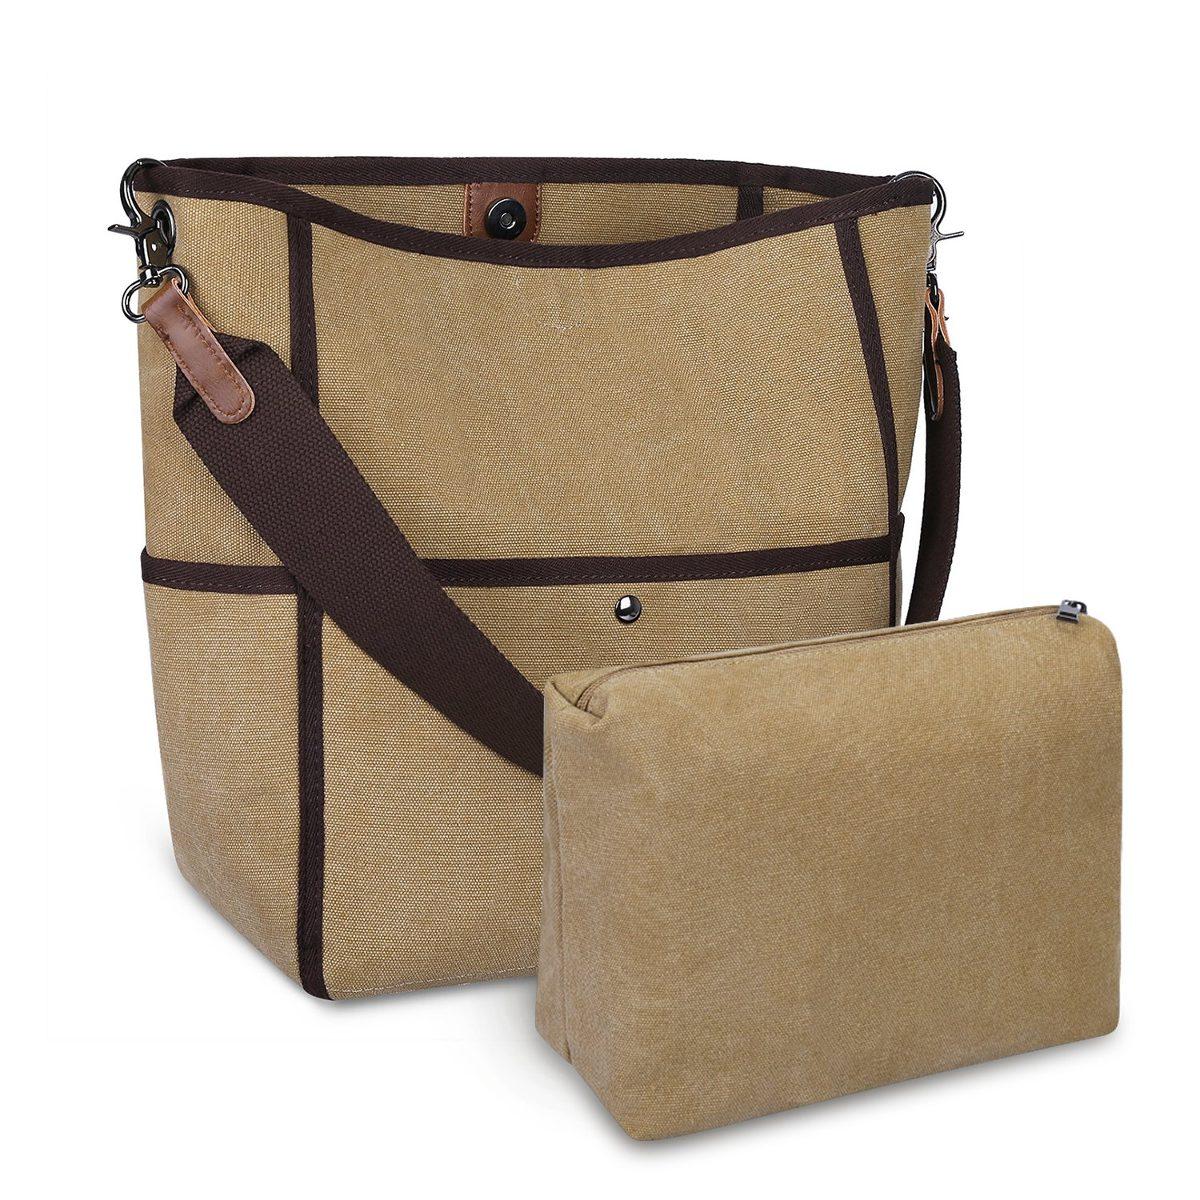 5685021ce s-zone bolso de lona para mujer bolso informal bolso de m. Cargando zoom.